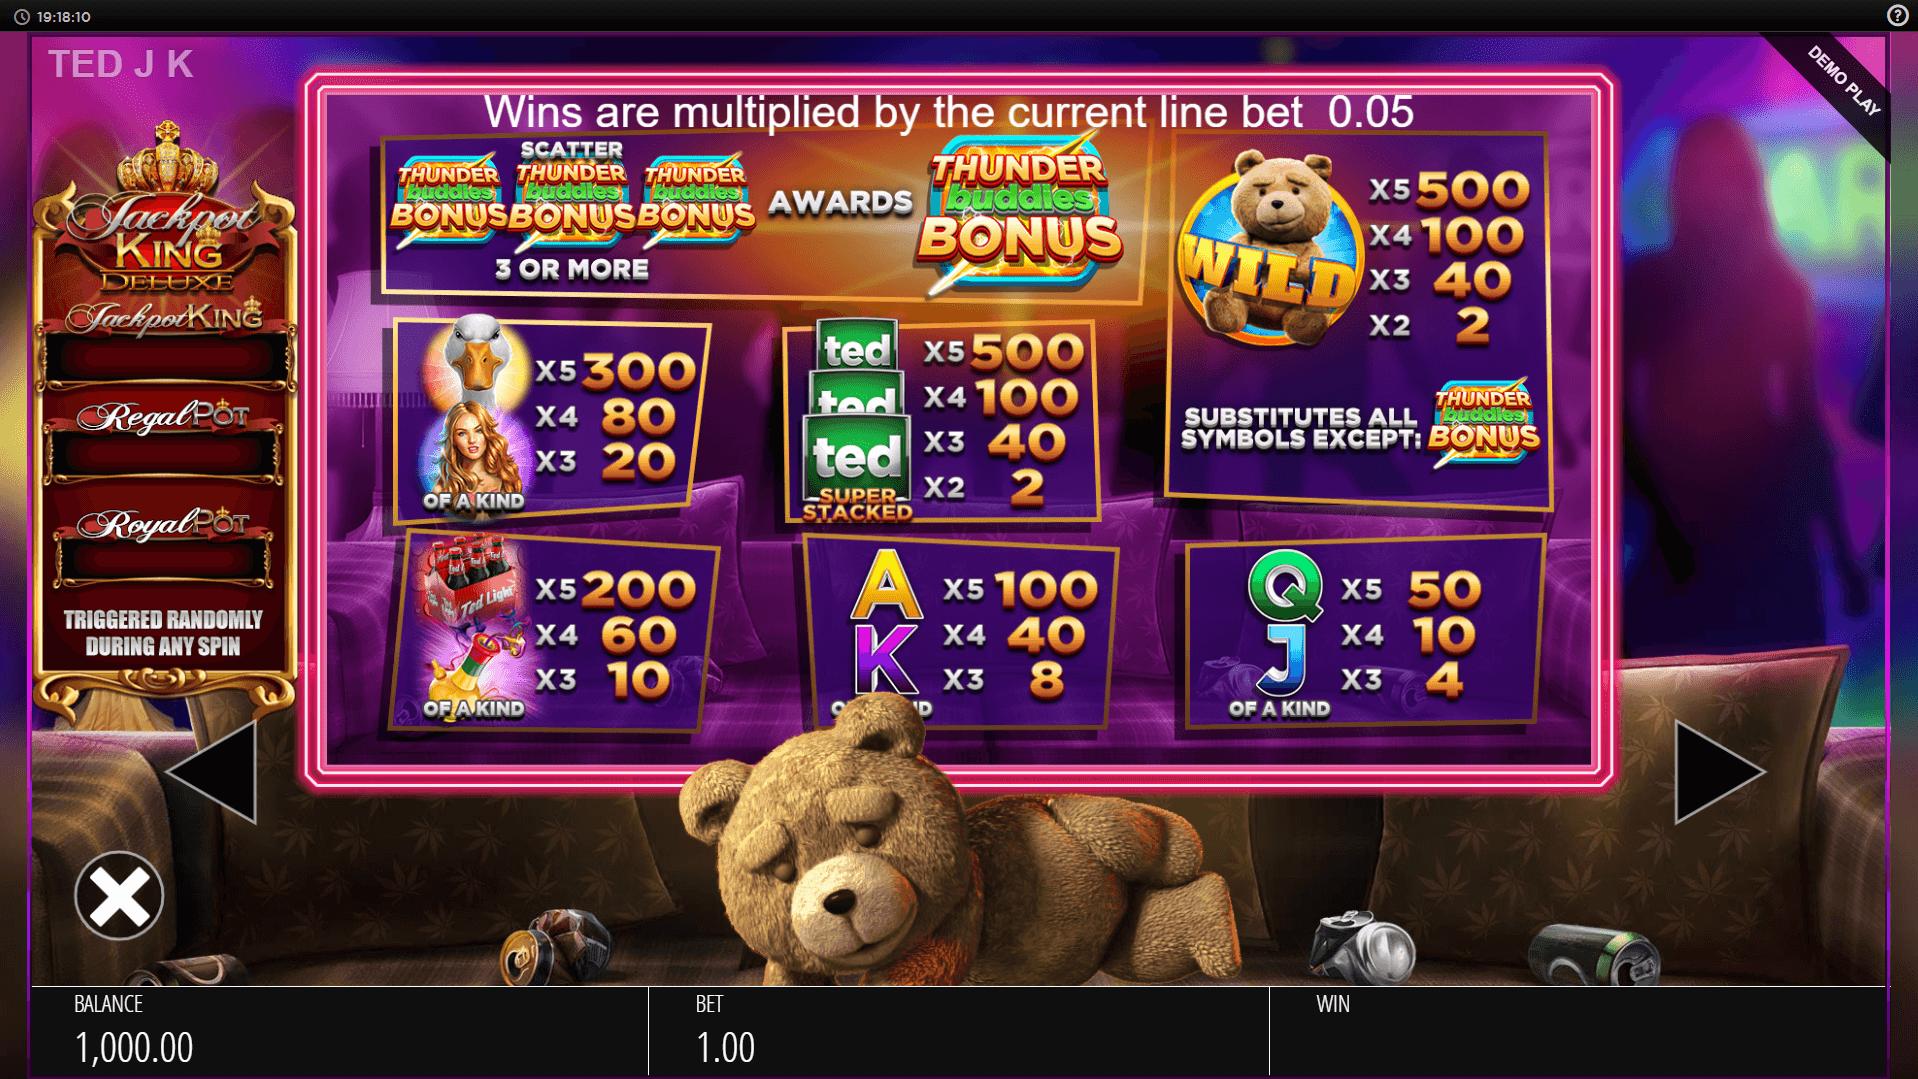 Ted Jackpot King Slot Machine